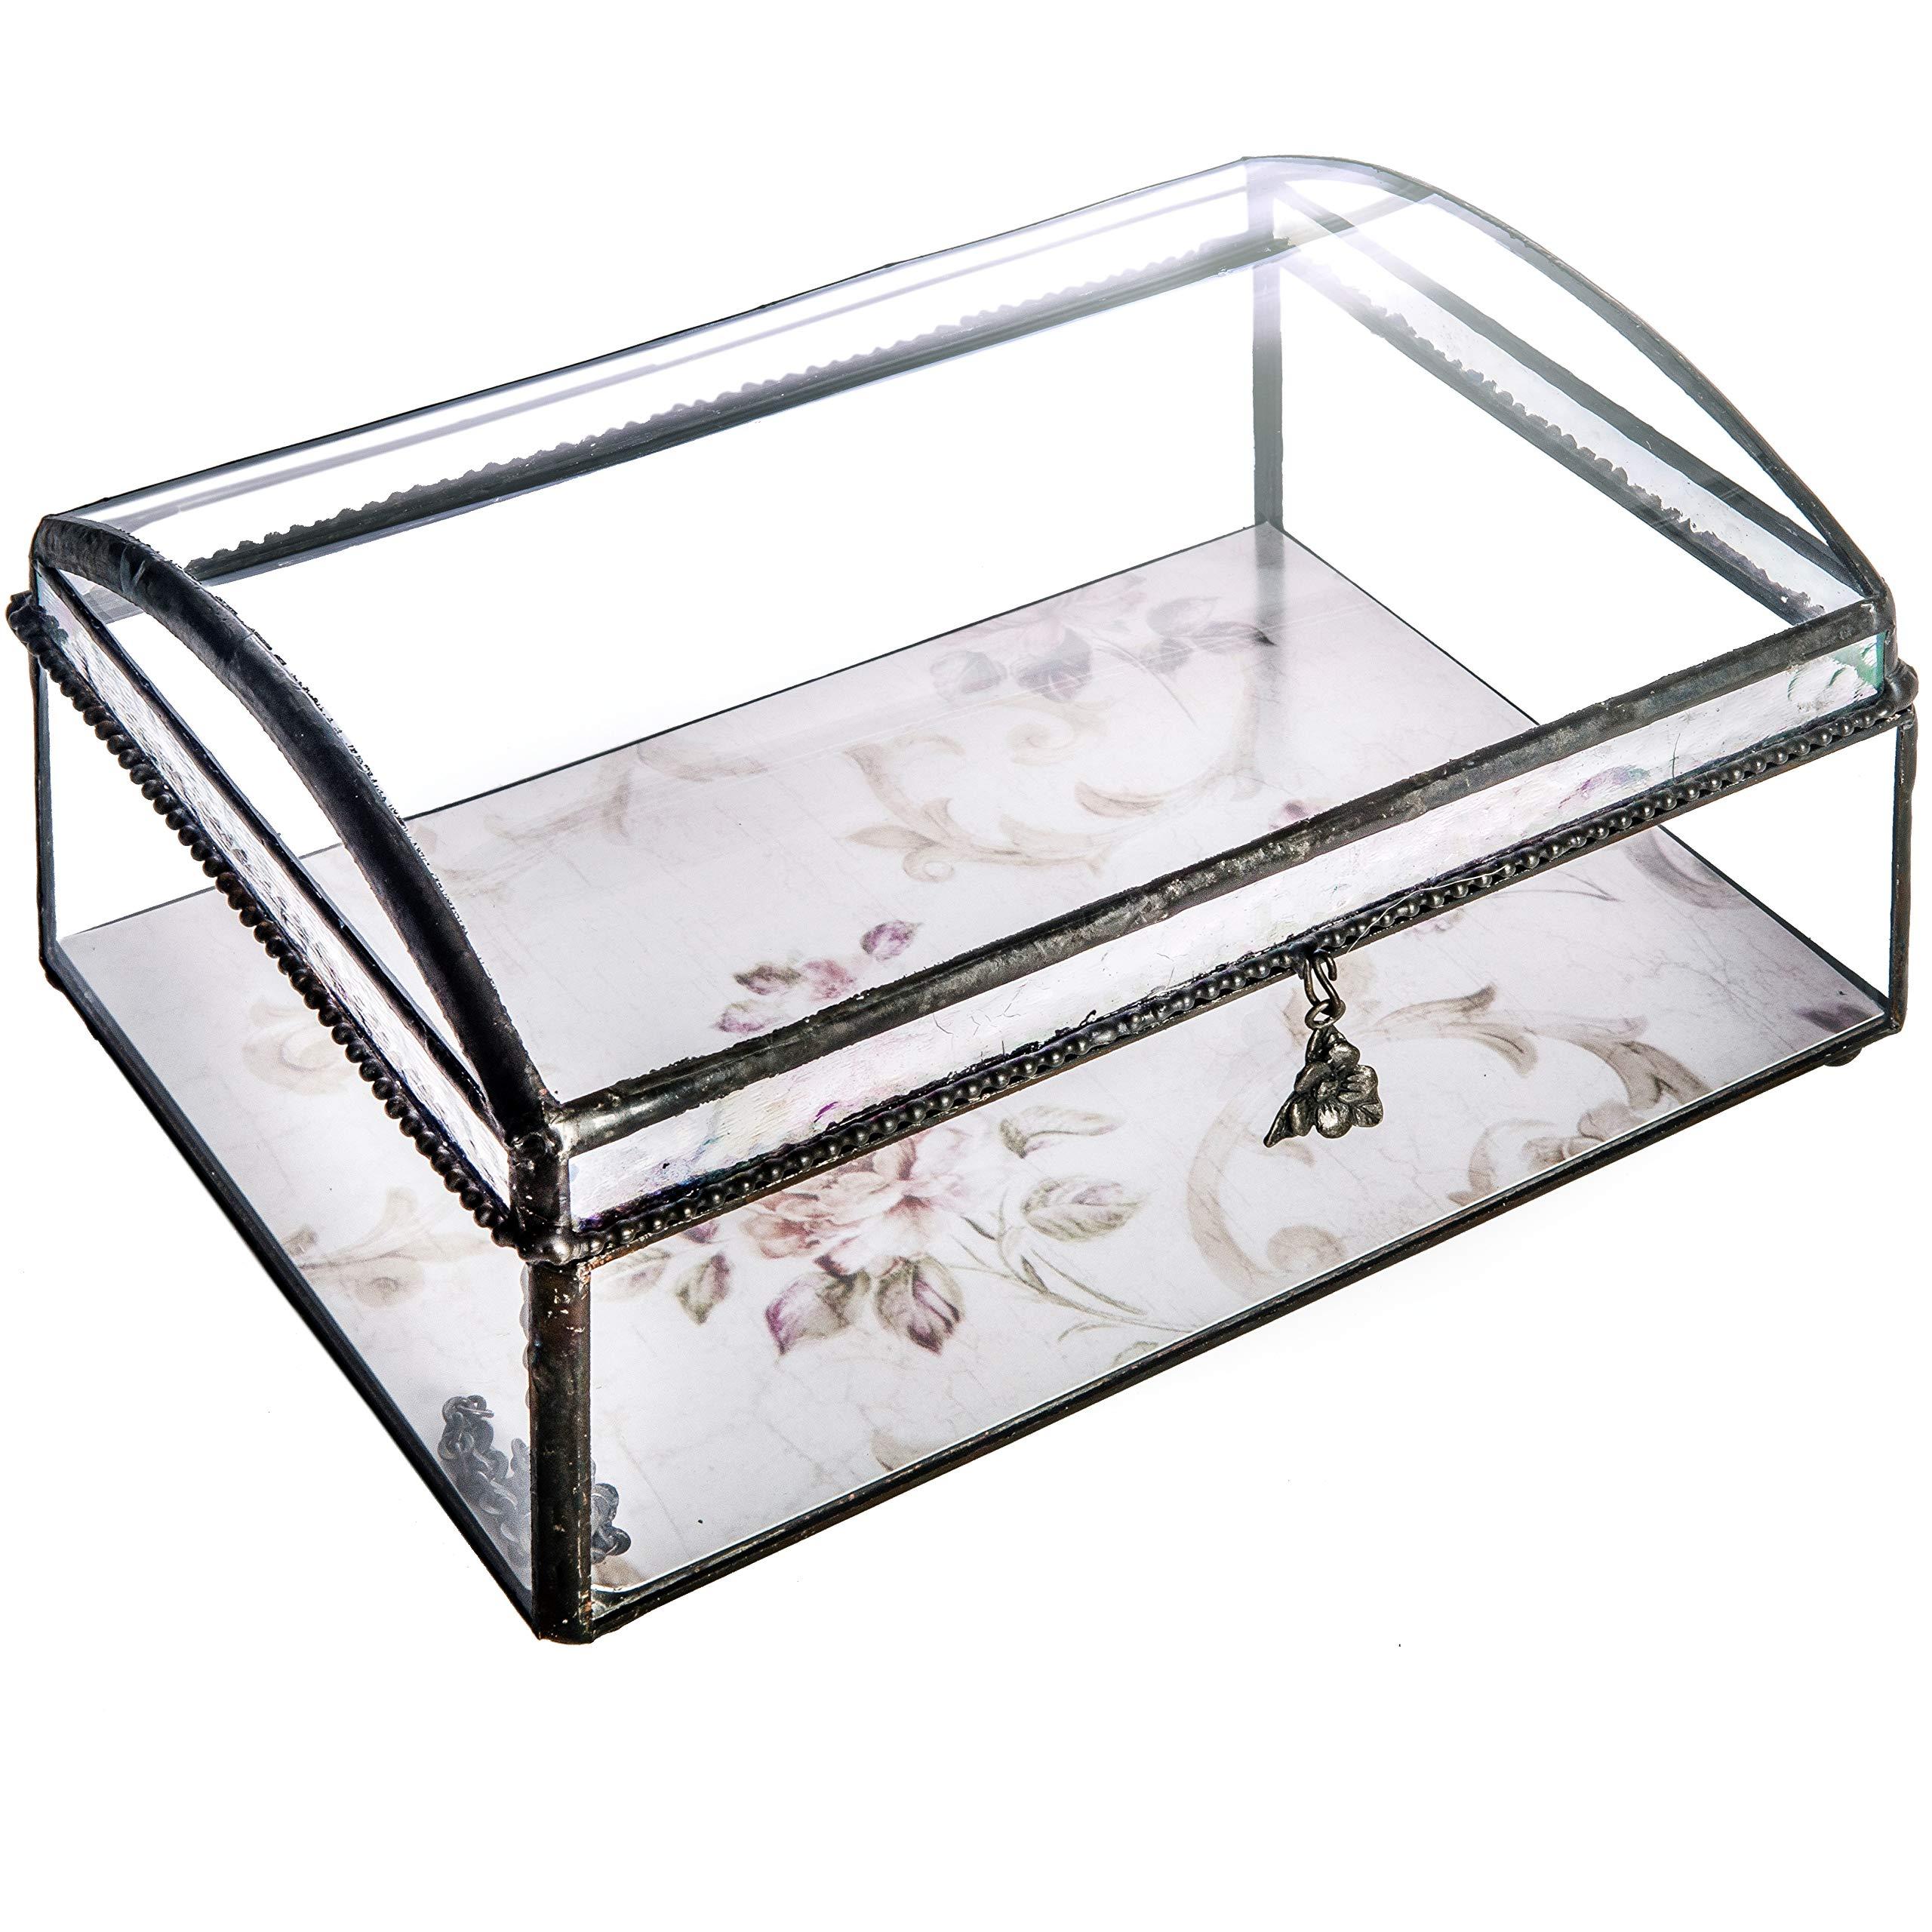 J Devlin Box 704 Clear Curved Glass Keepsake Box Wedding Invitation Display Remove and Replace Artwork